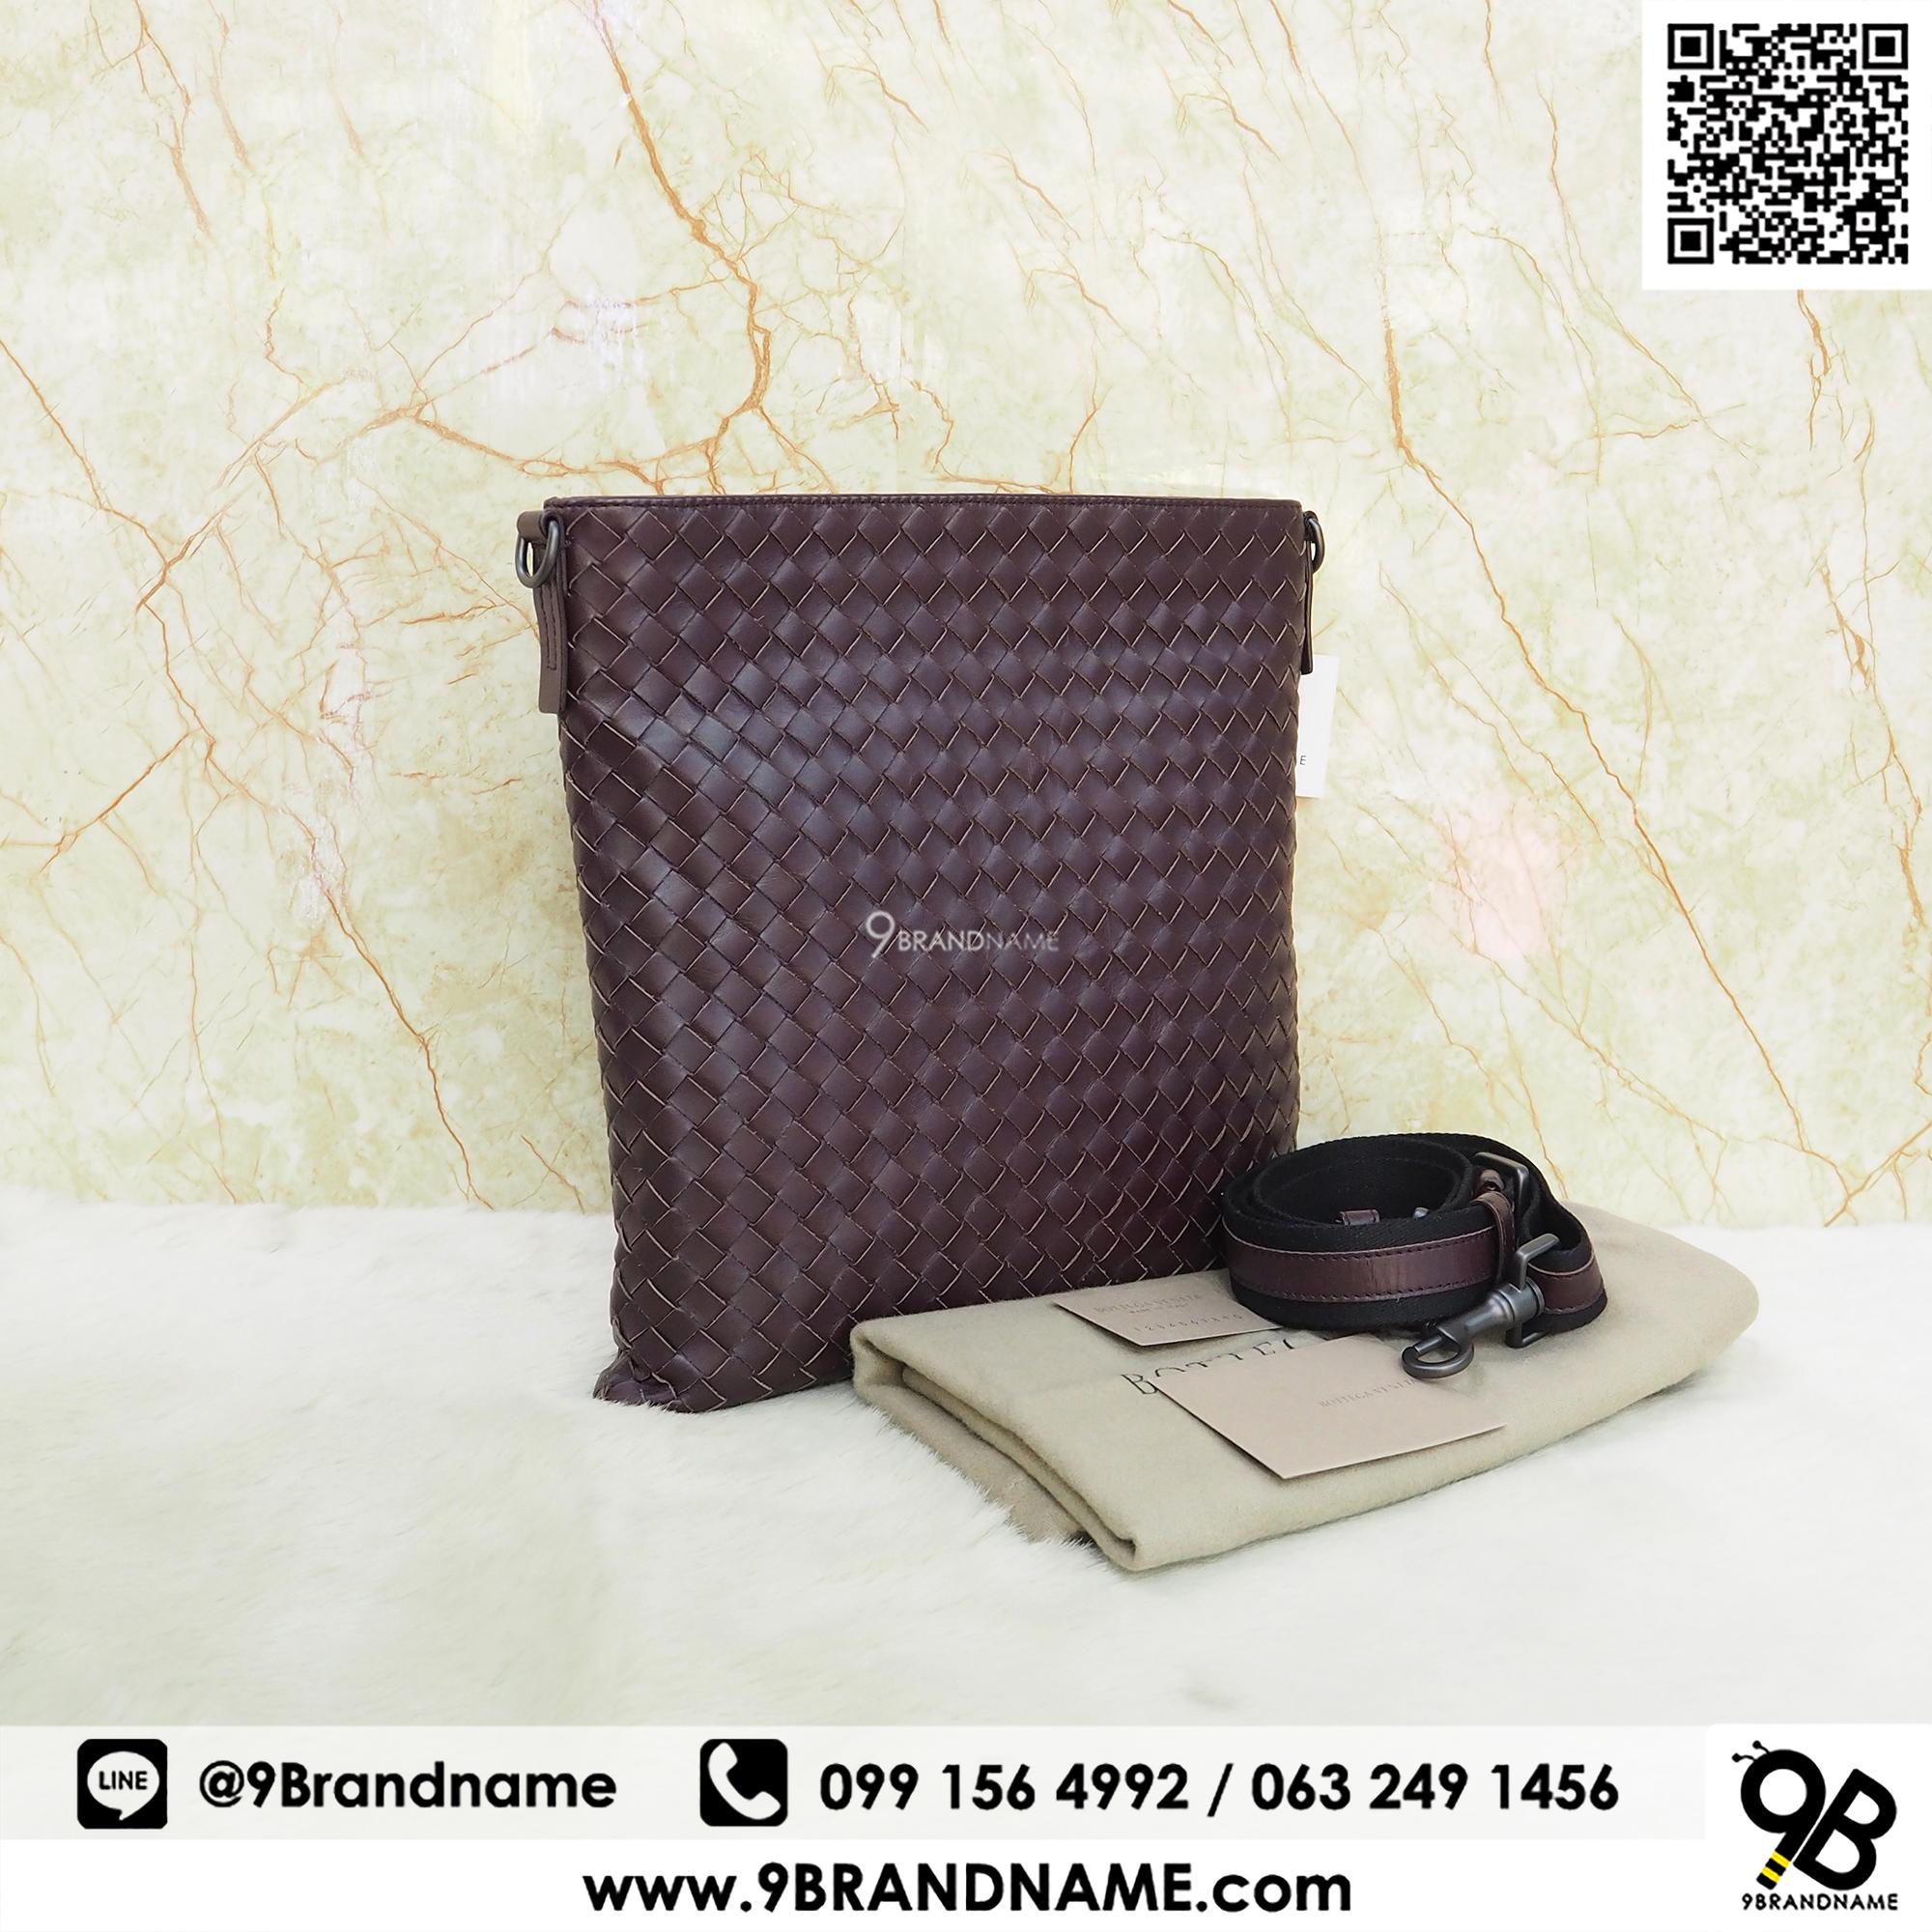 Bottega Veneta Men's Red Brown Intrecciato Leather Messenger Bag